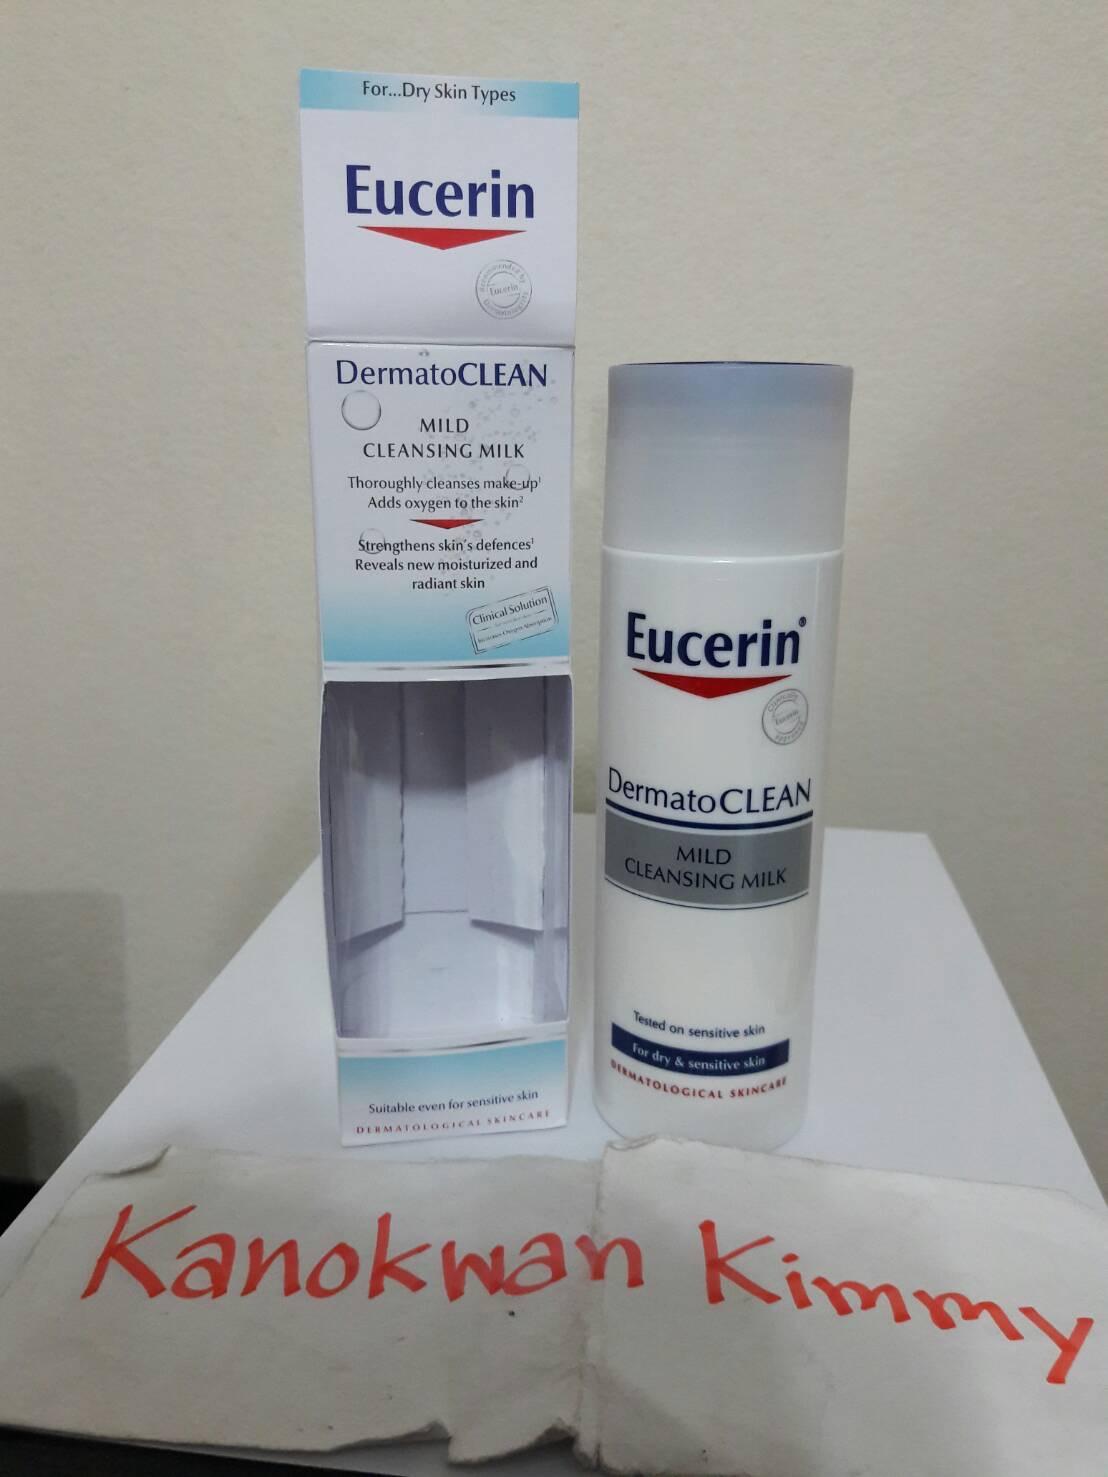 #EUCERIN DermatoCLEAN Refreshing Cleansing Milk 200ml